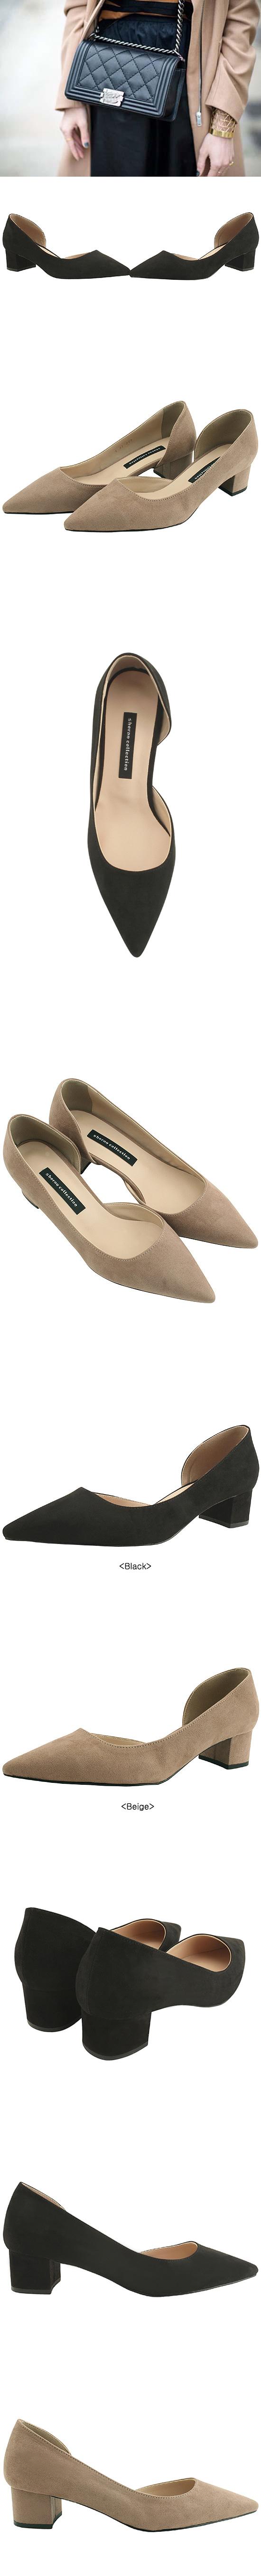 Stiletto Suede Low Heel 4cm Beige